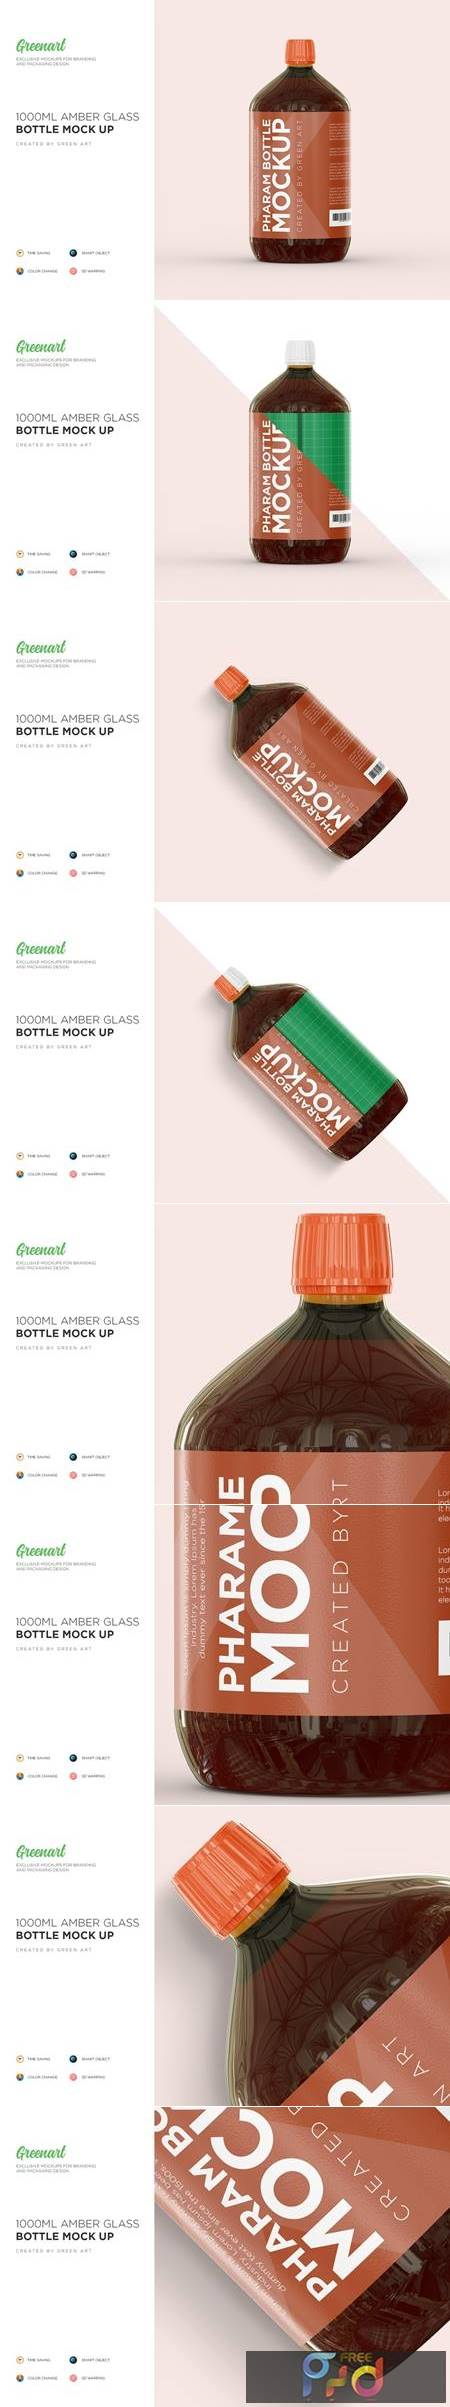 1000ml Amber Glass Bottle Mockup 3082981 1